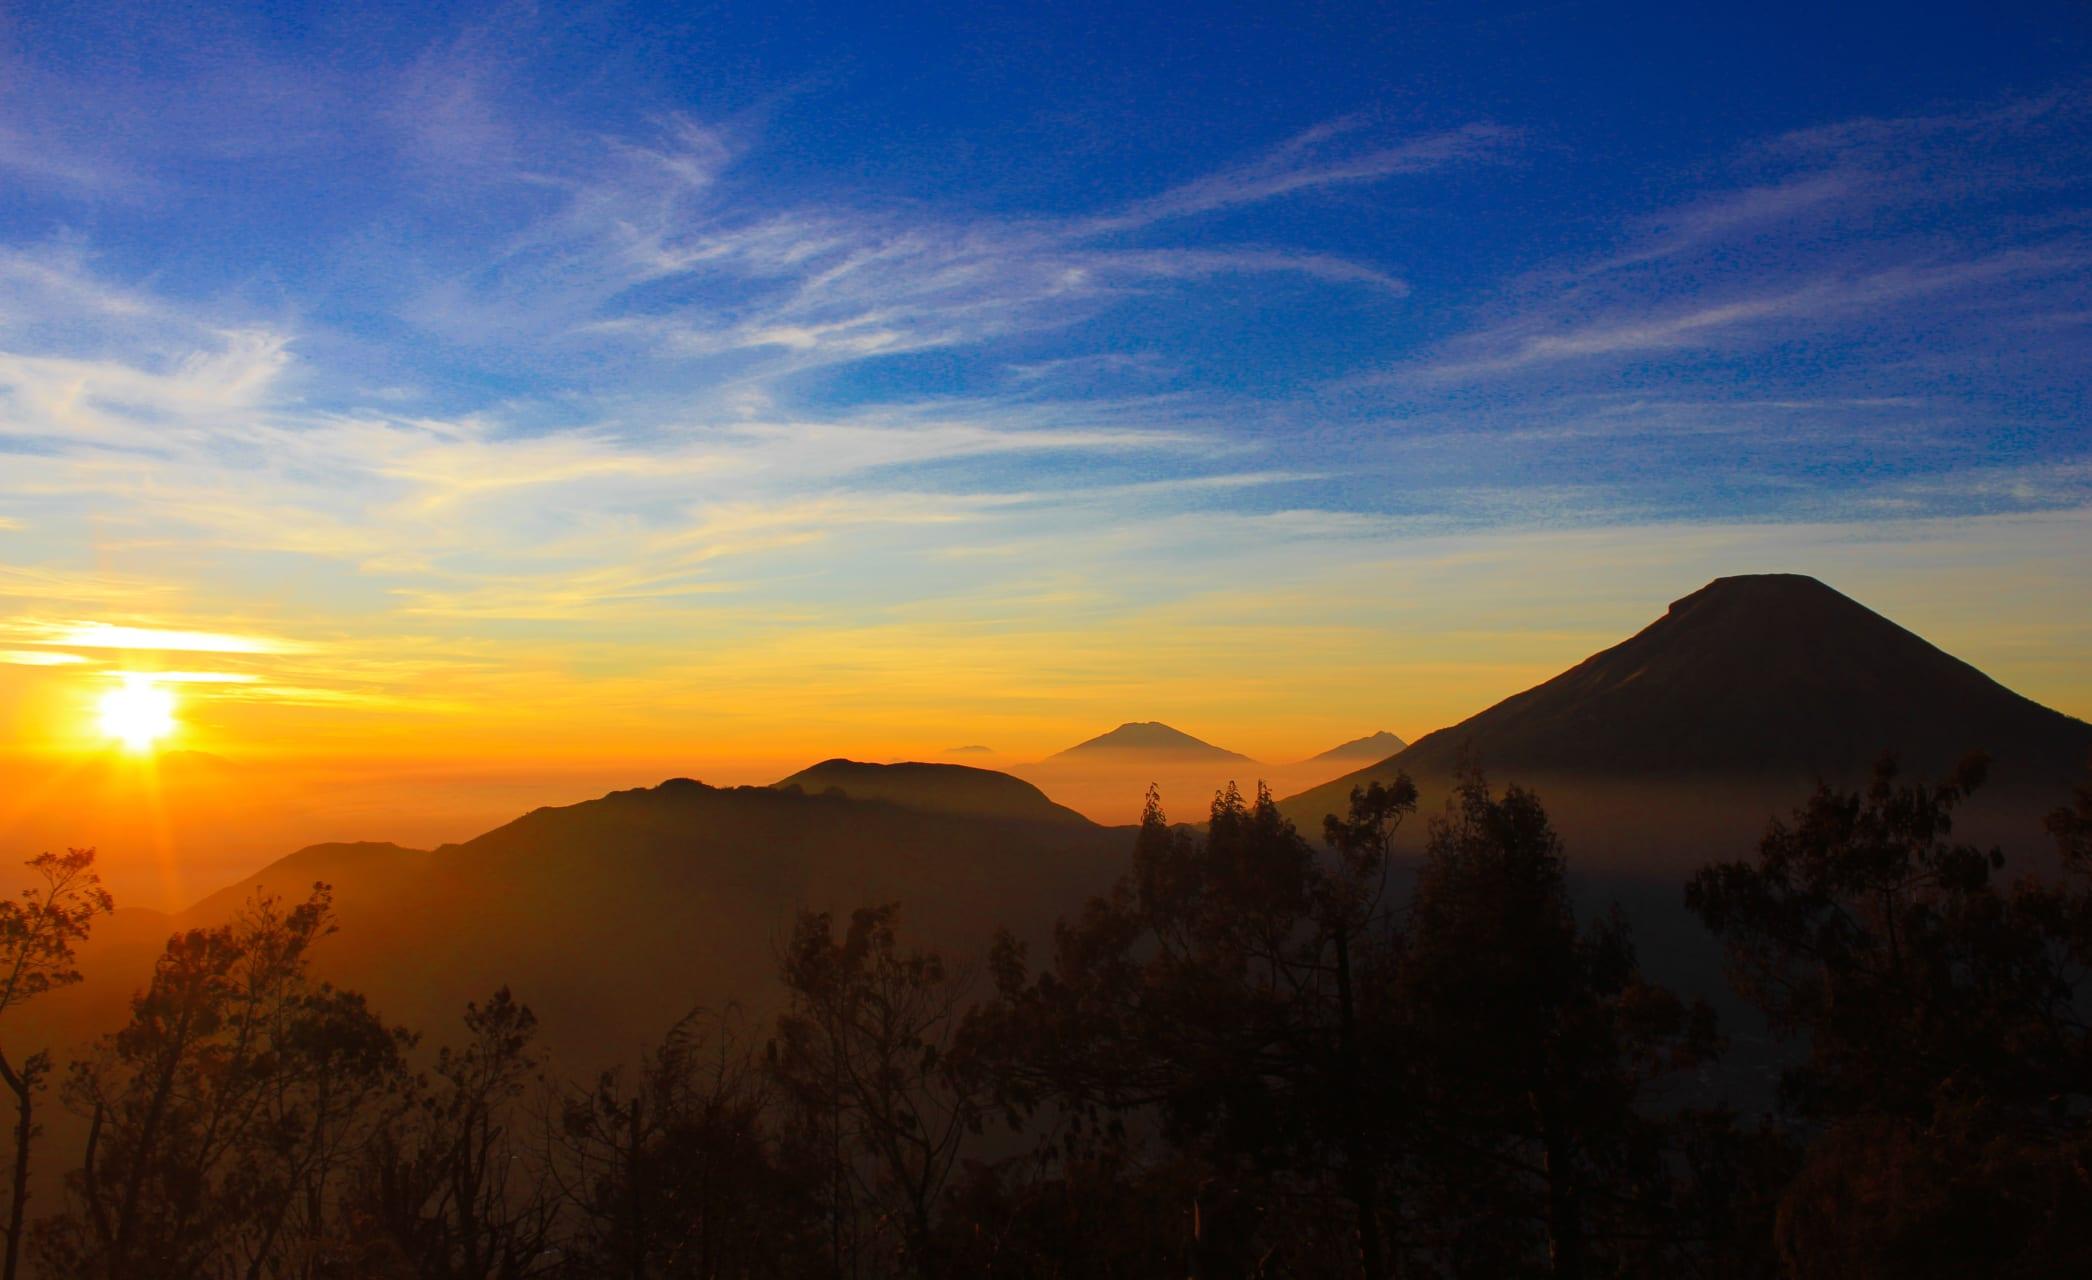 Wonosobo - The Magnificent Golden Sunrise on Sikunir Hill